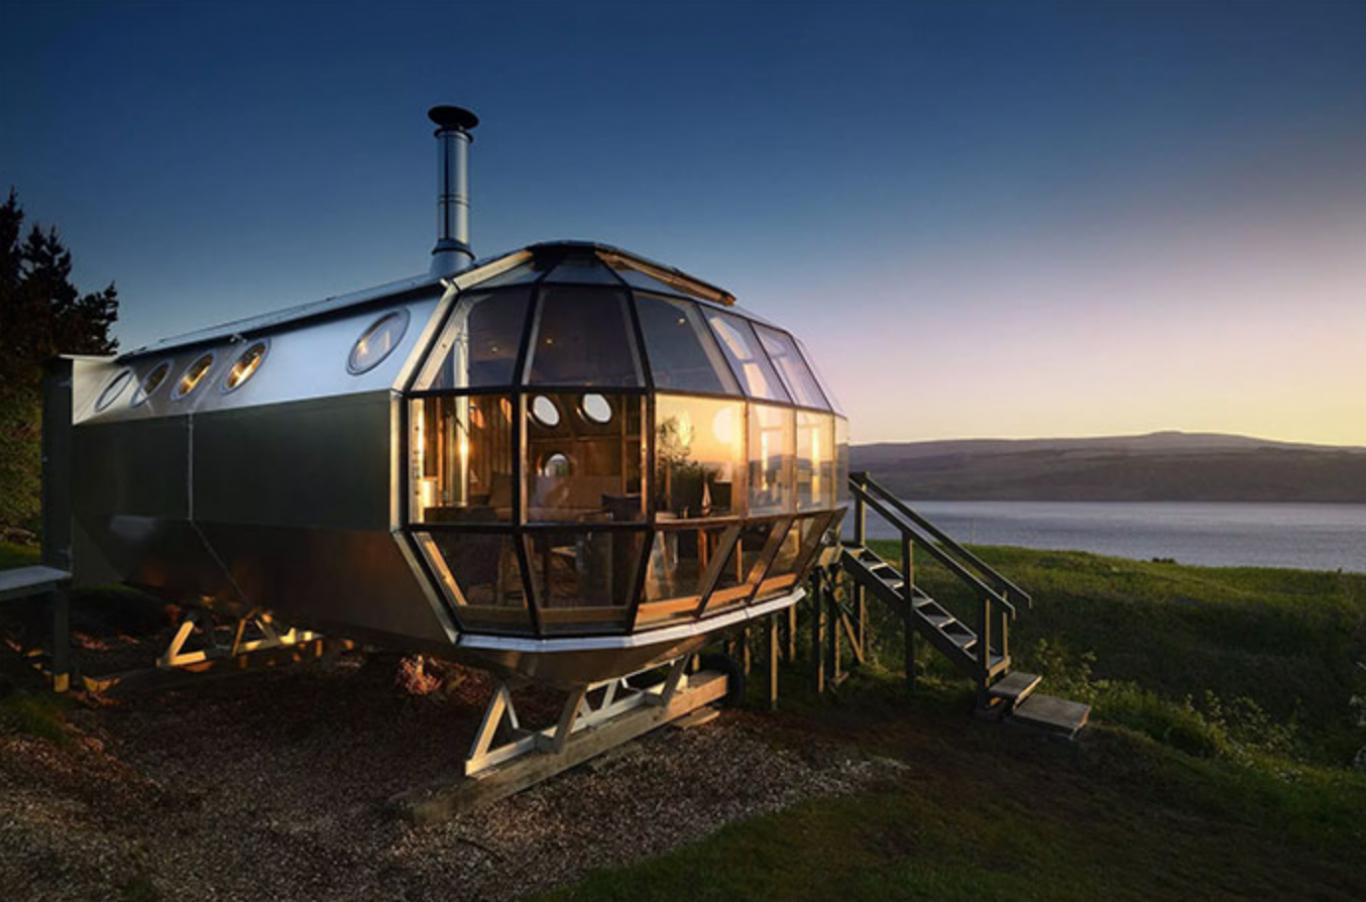 airbnb de sonho 9